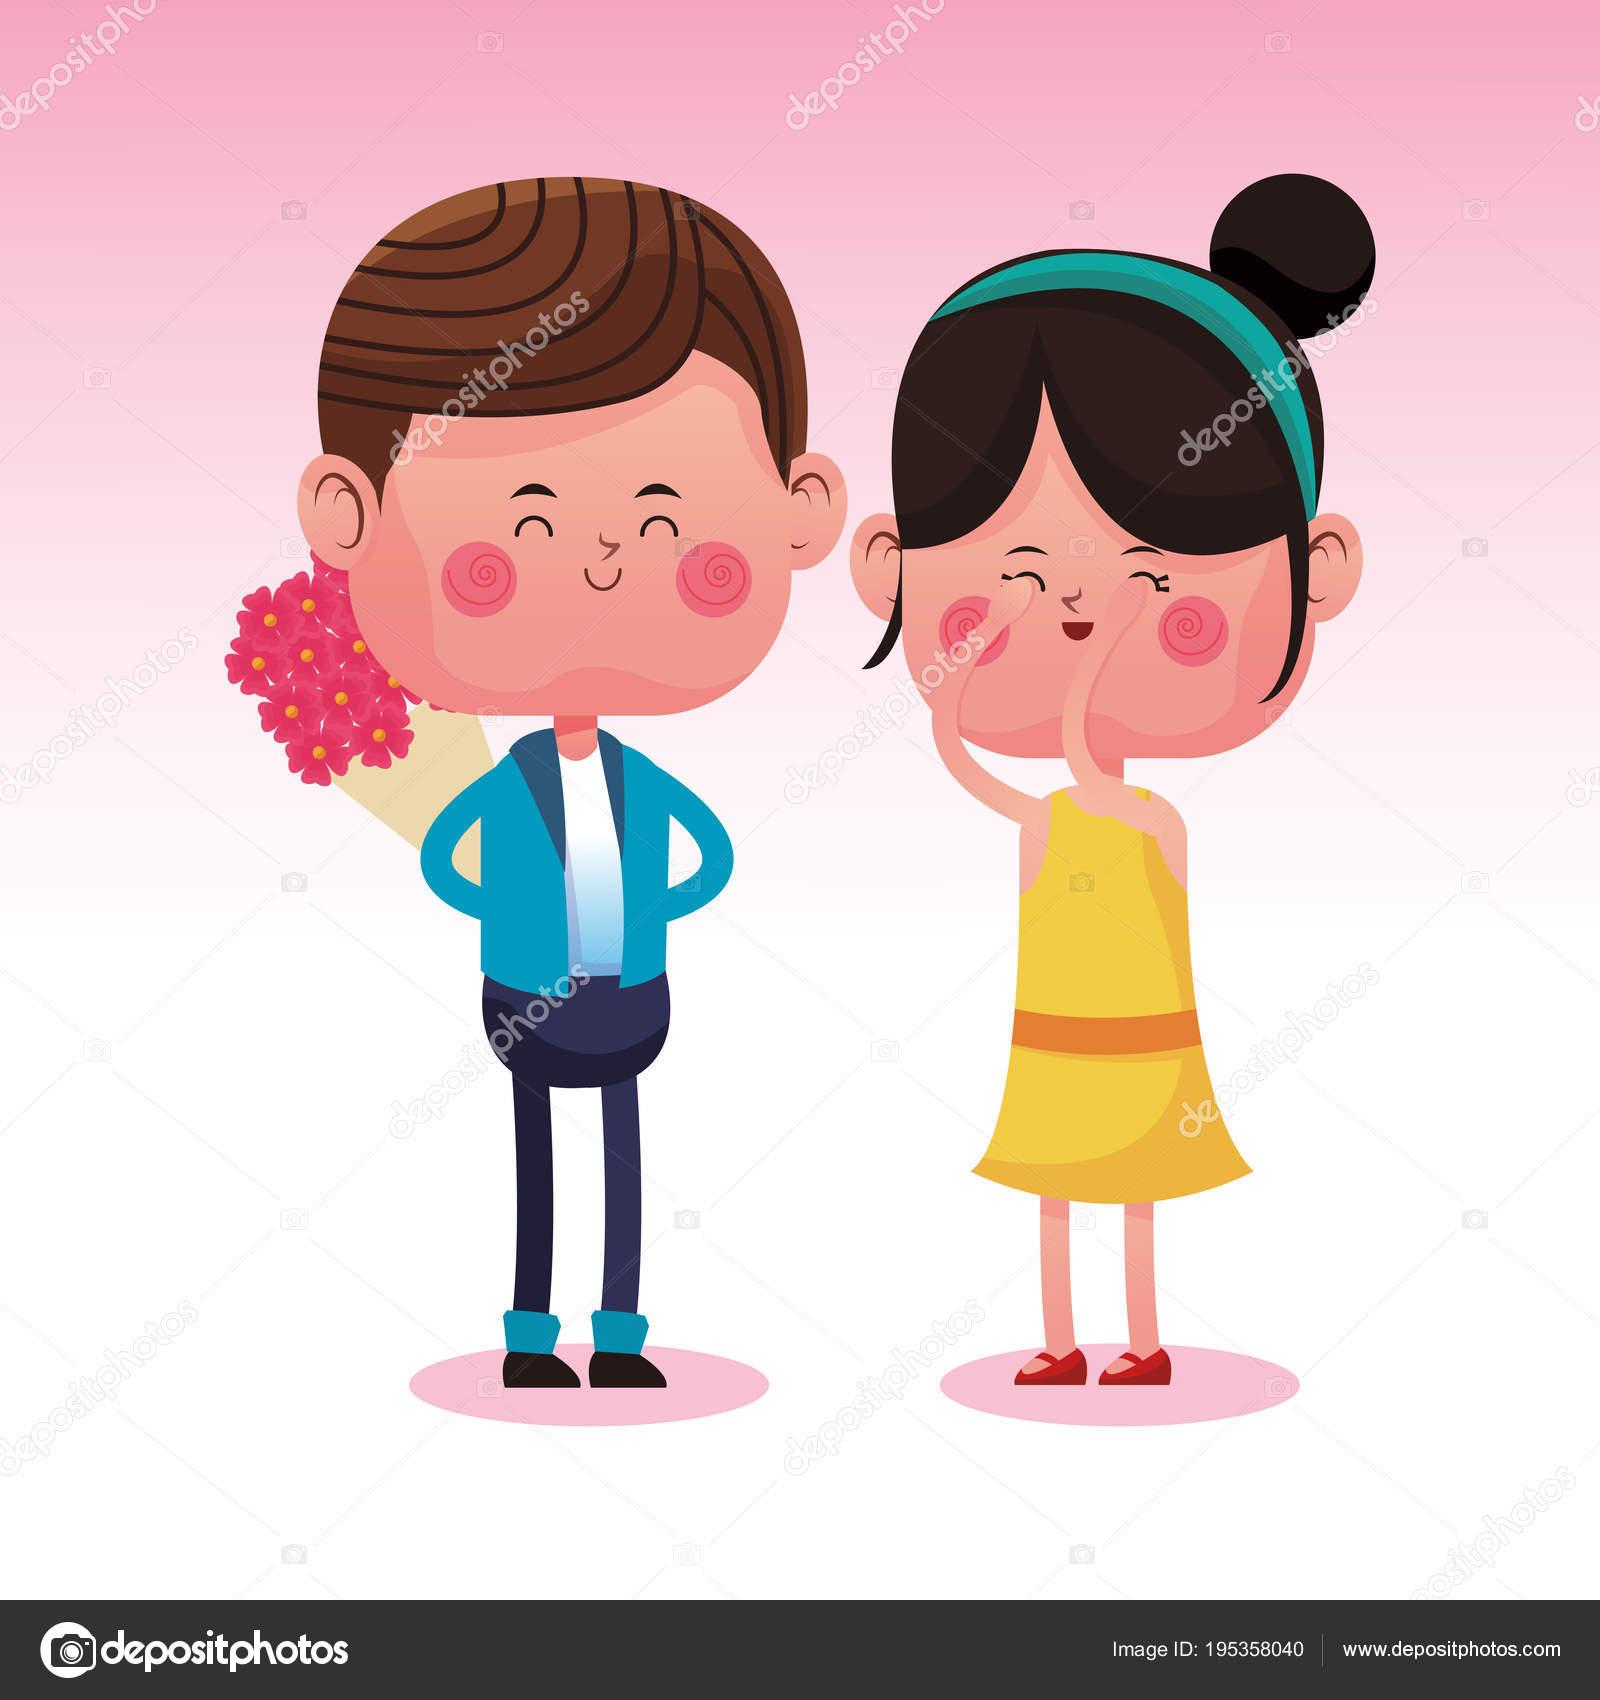 Cute Couple In Love Cartoons Stock Vector C Jemastock 195358040